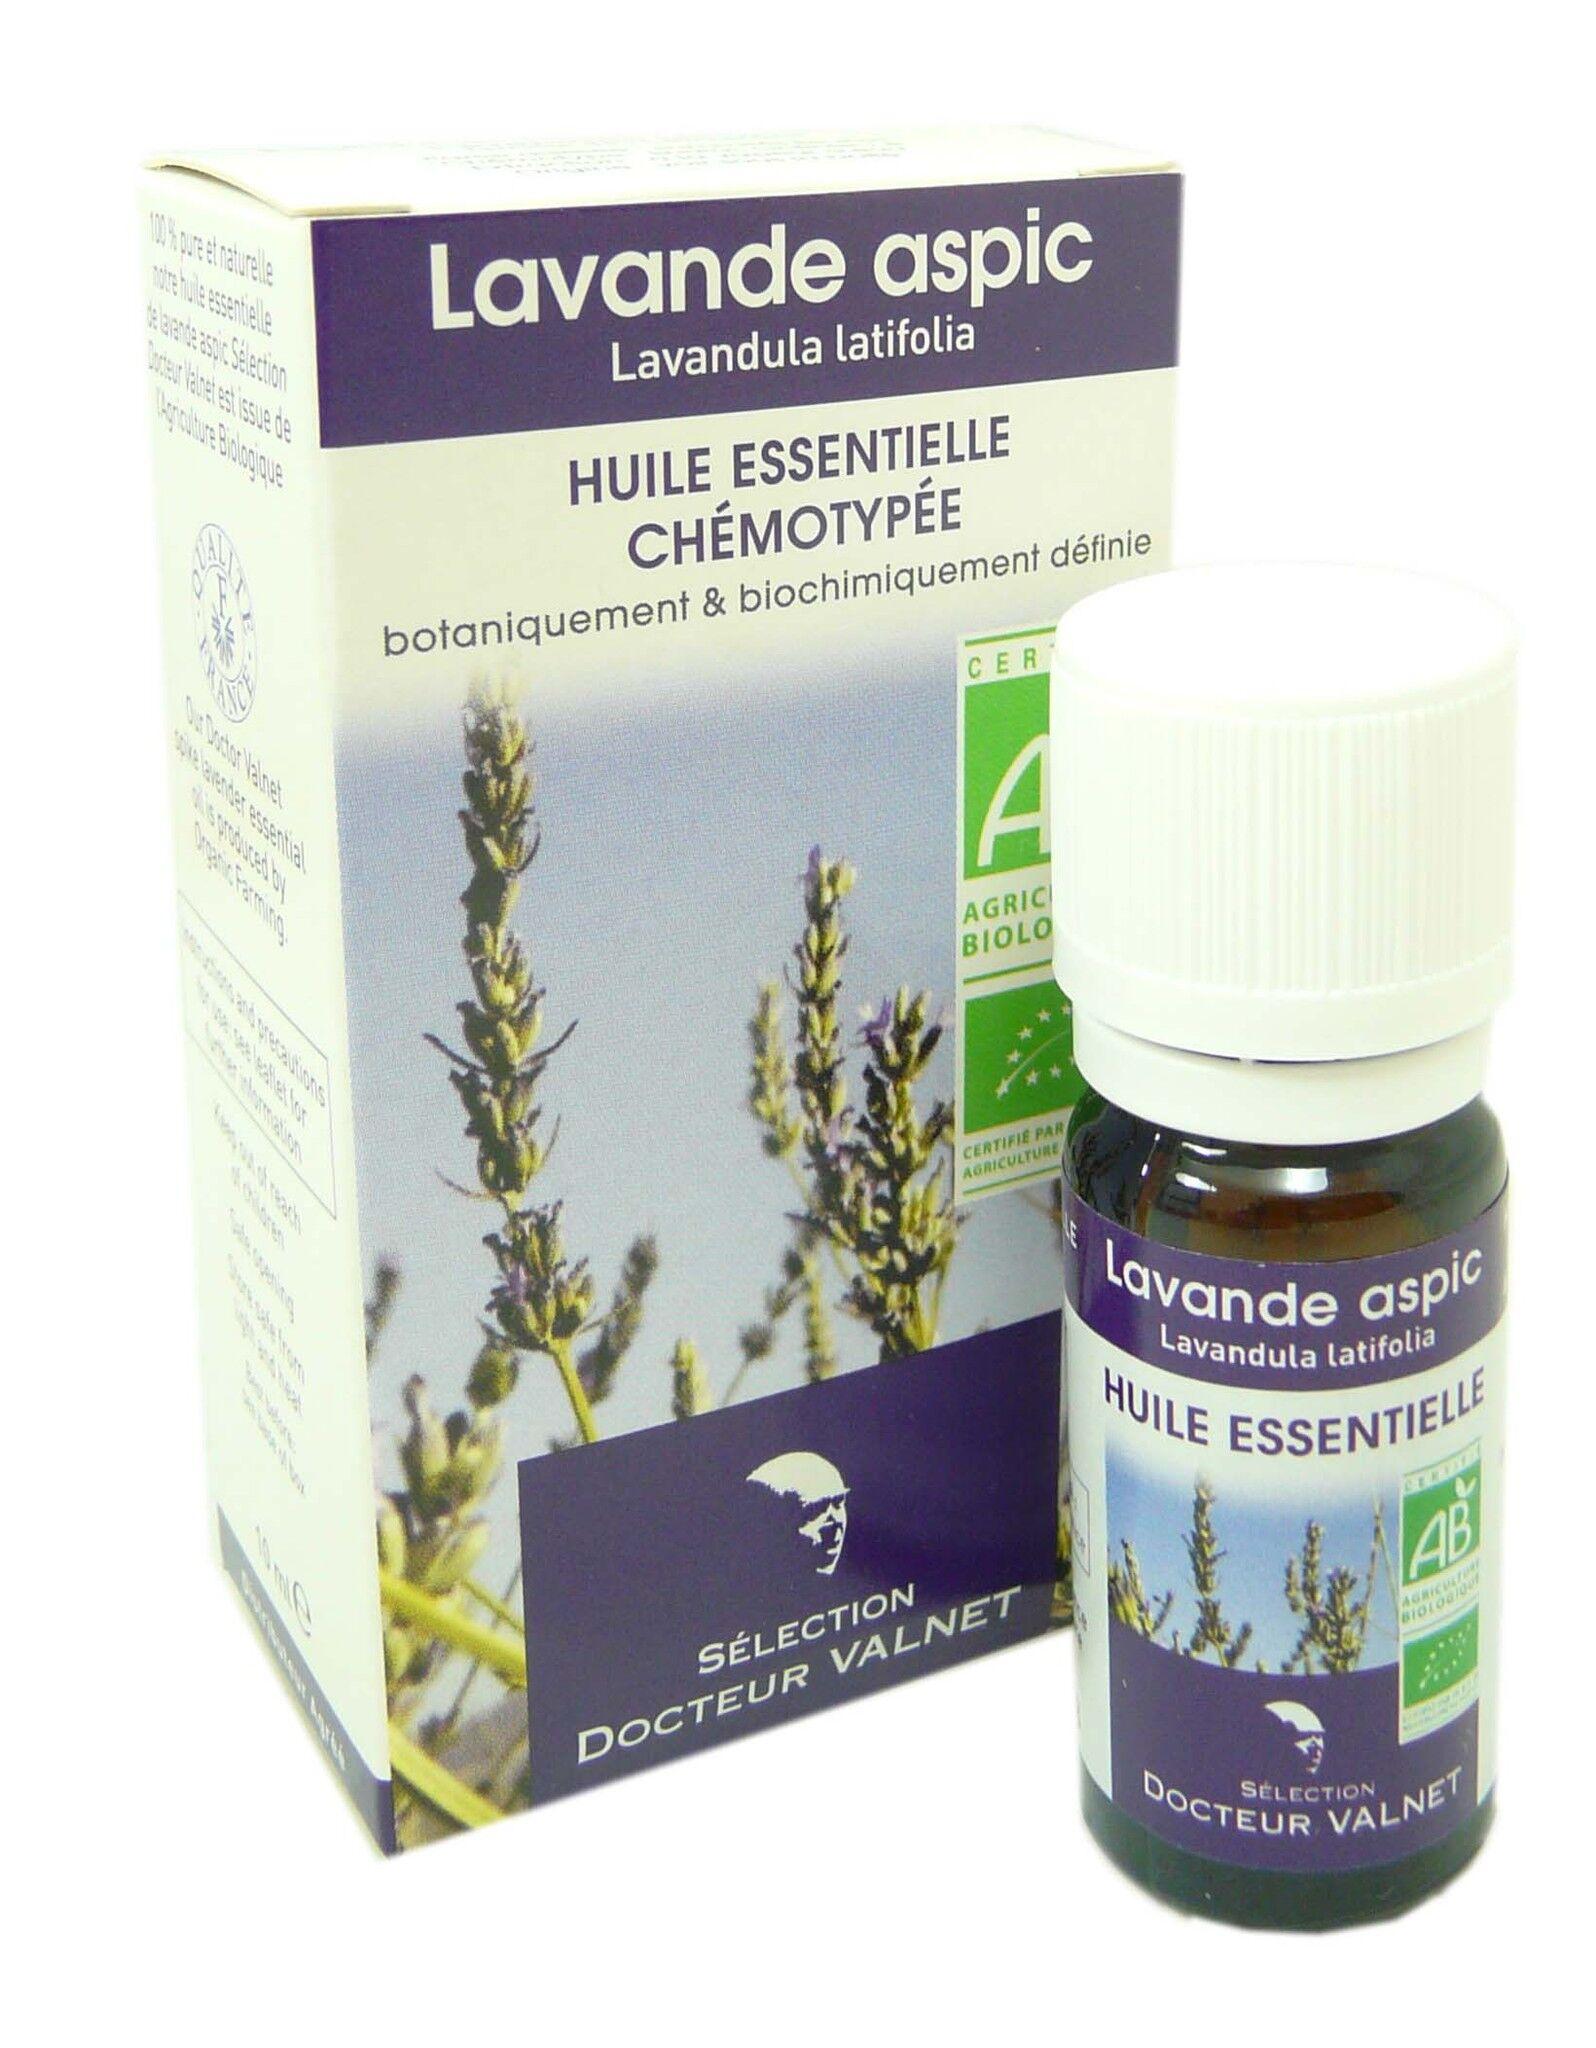 PRANAROM Dr valnet huile essentielle lavande 10ml